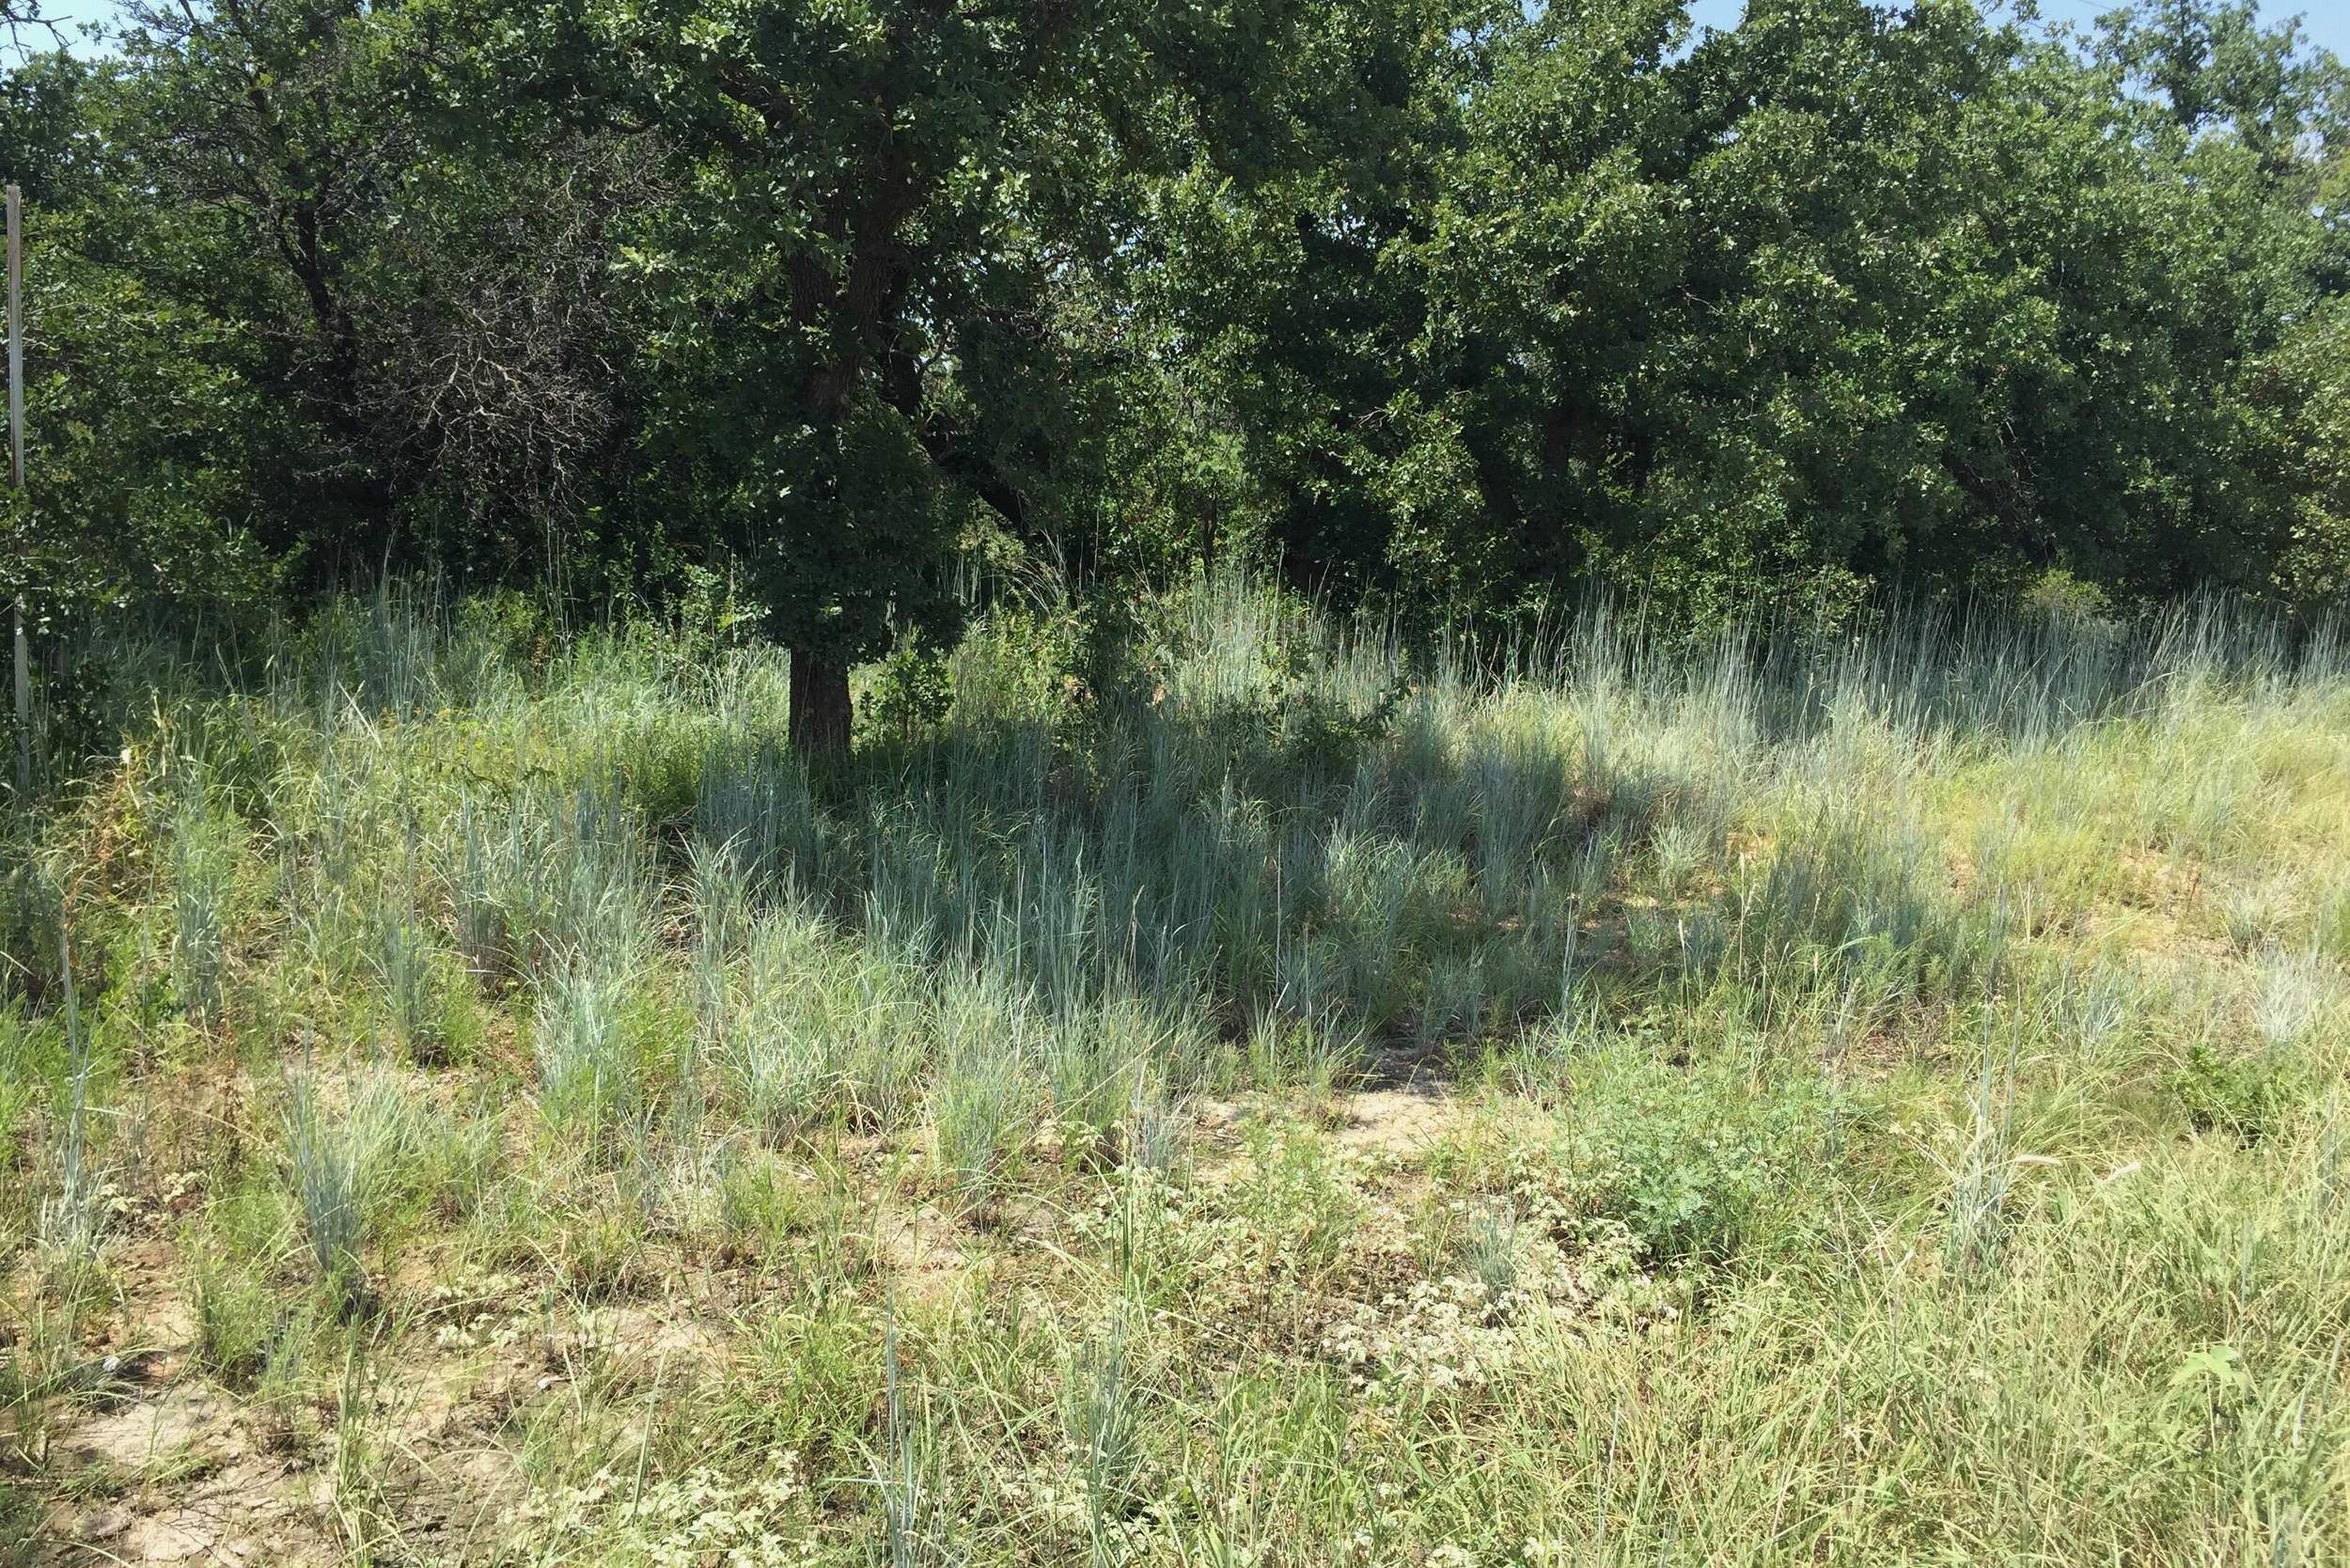 Stand of Schizachyrium scoparium (Little Bluestem) beneath Quercus stellata (Post Oak) along Cement Mountain Road in SE Young Co., Texas